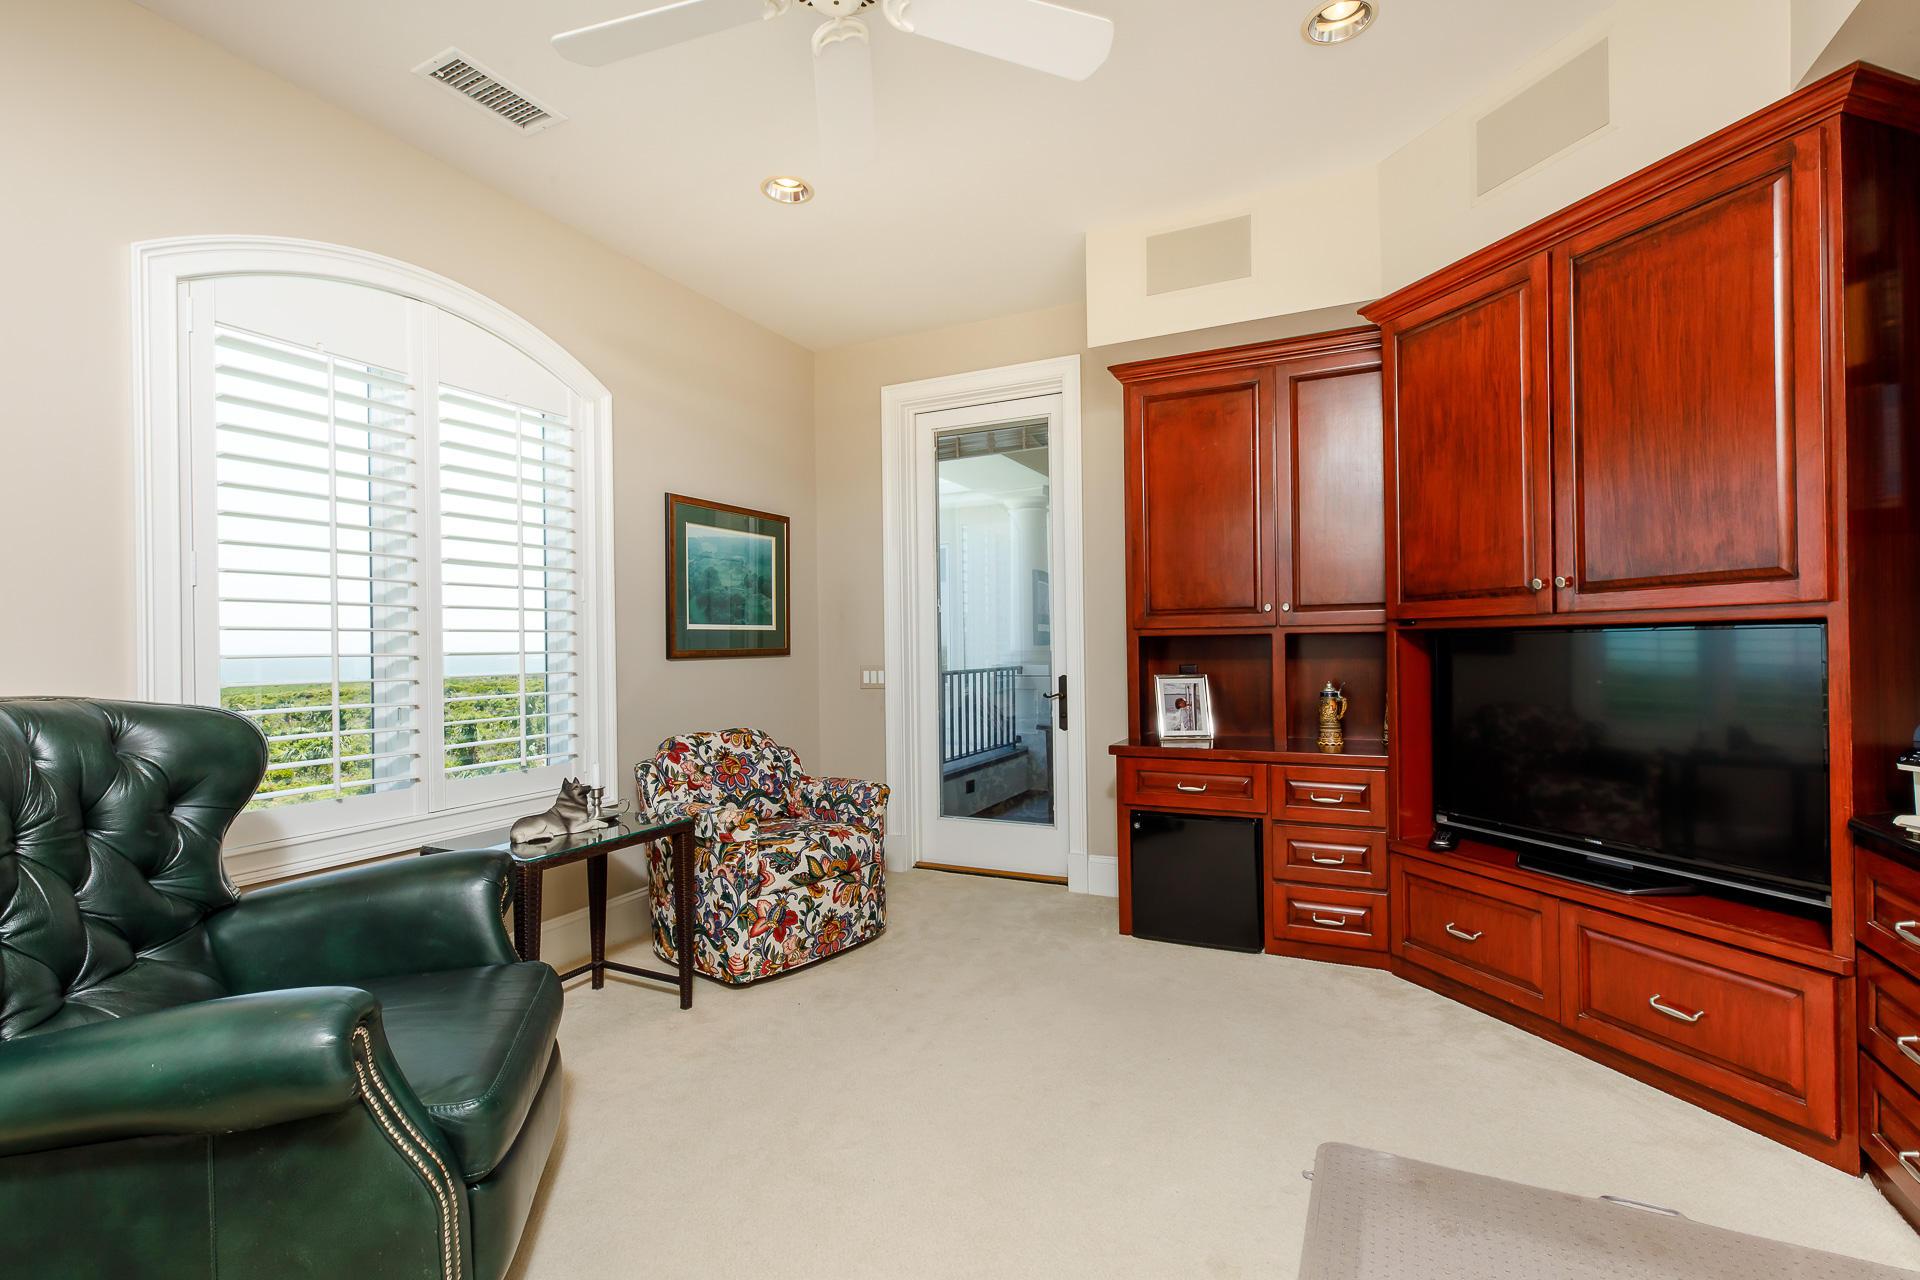 Seabrook Island Homes For Sale - 2216 Rolling Dune, Seabrook Island, SC - 80